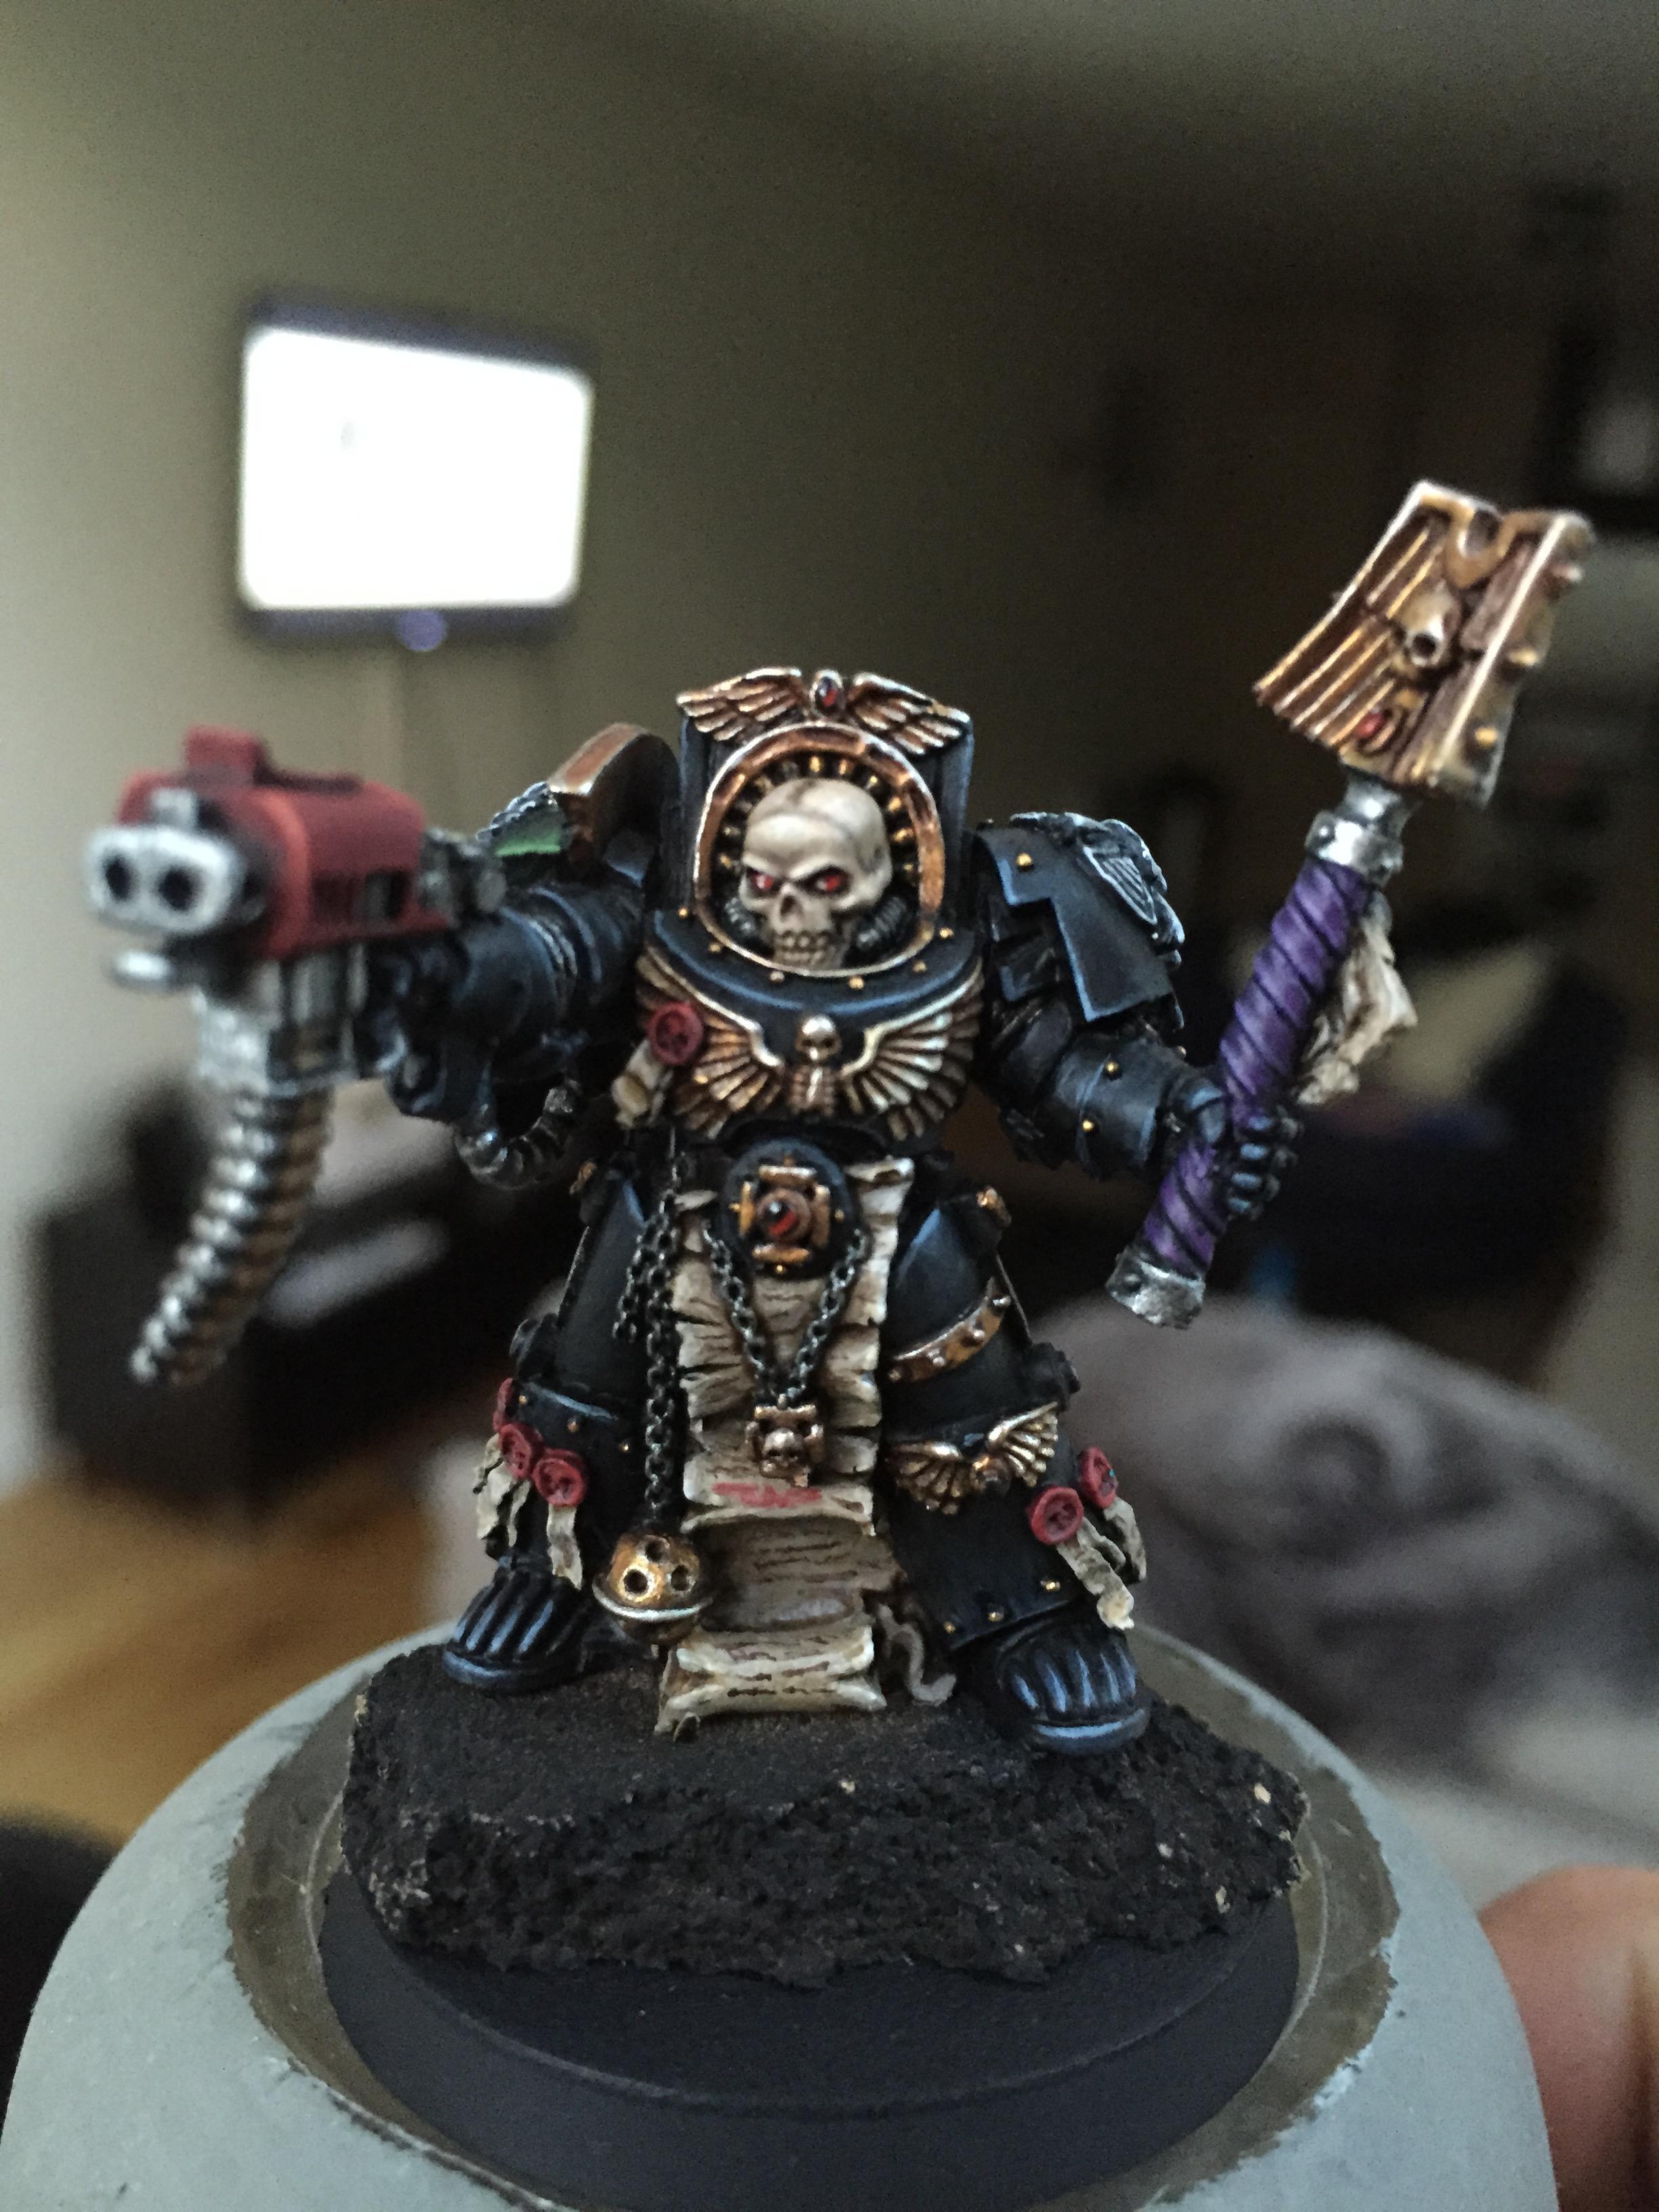 Adeptus Astartes, Chaplain, Space Marines, Terminator Armor, Warhammer 40,000